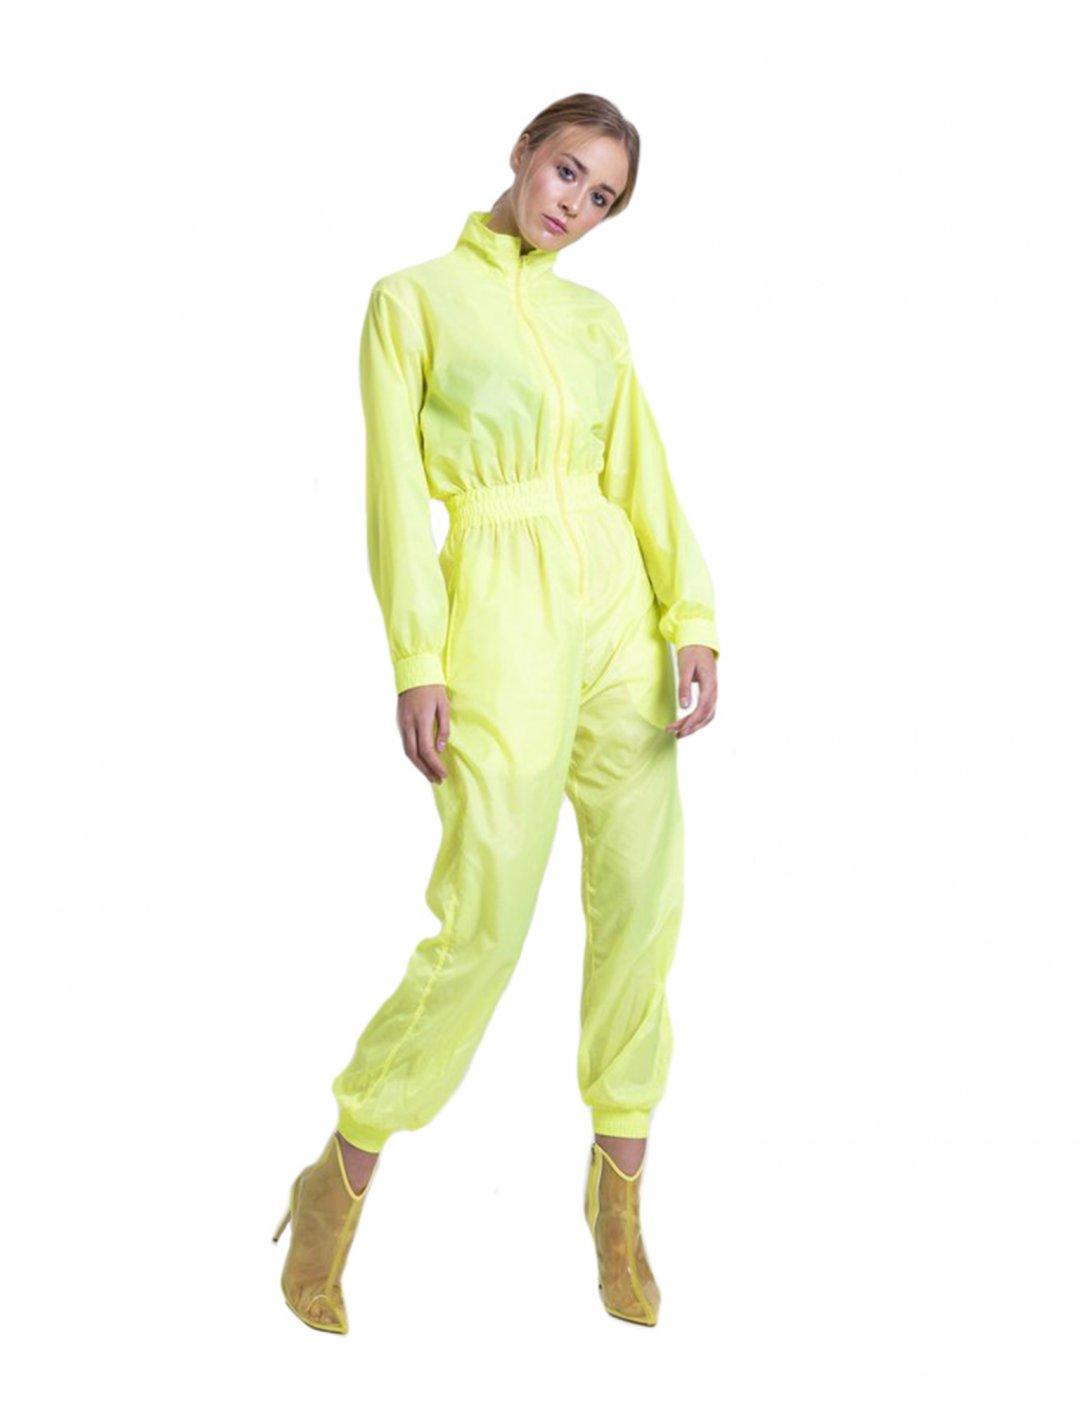 Raja Kumari's Jumpsuit Clothing Laroxx